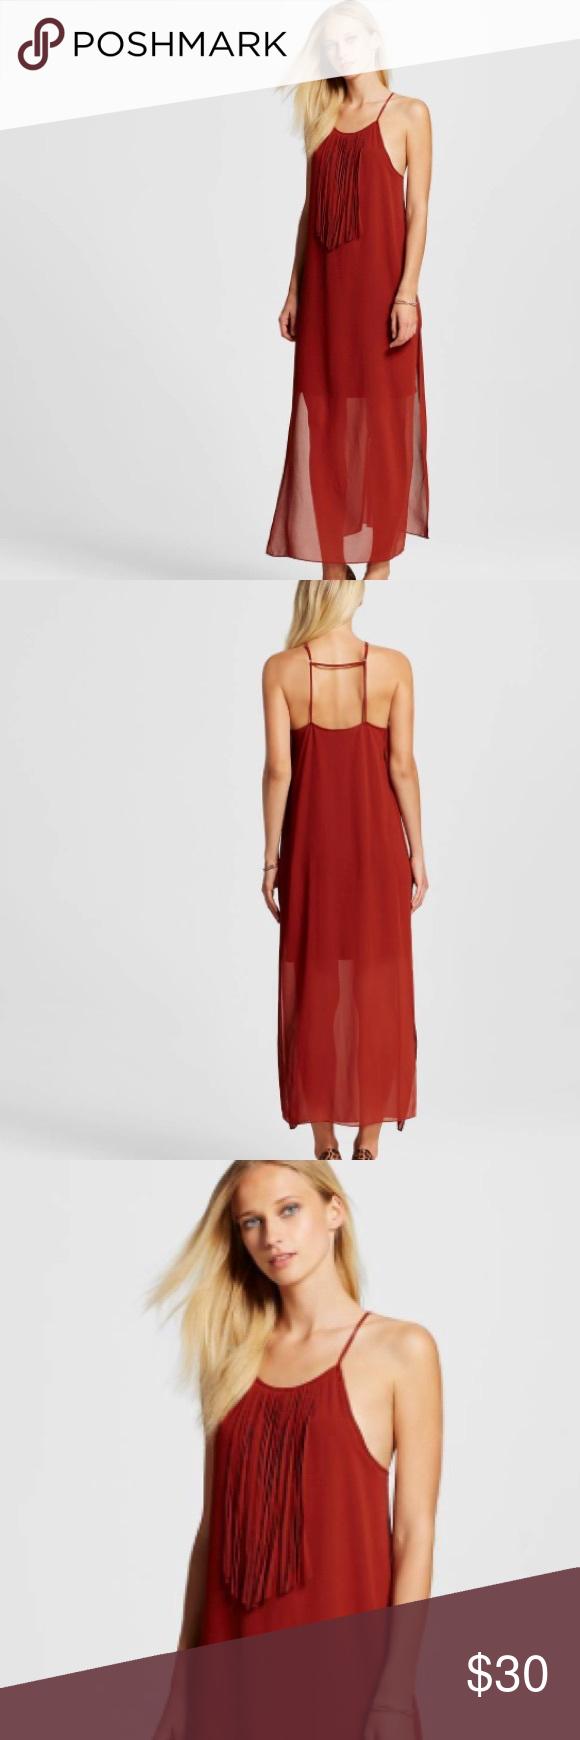 Rust Red Fringe Tank Maxi Dress Festival Sheer L Maxi Tank Dress Festival Dress Dresses [ 1740 x 580 Pixel ]